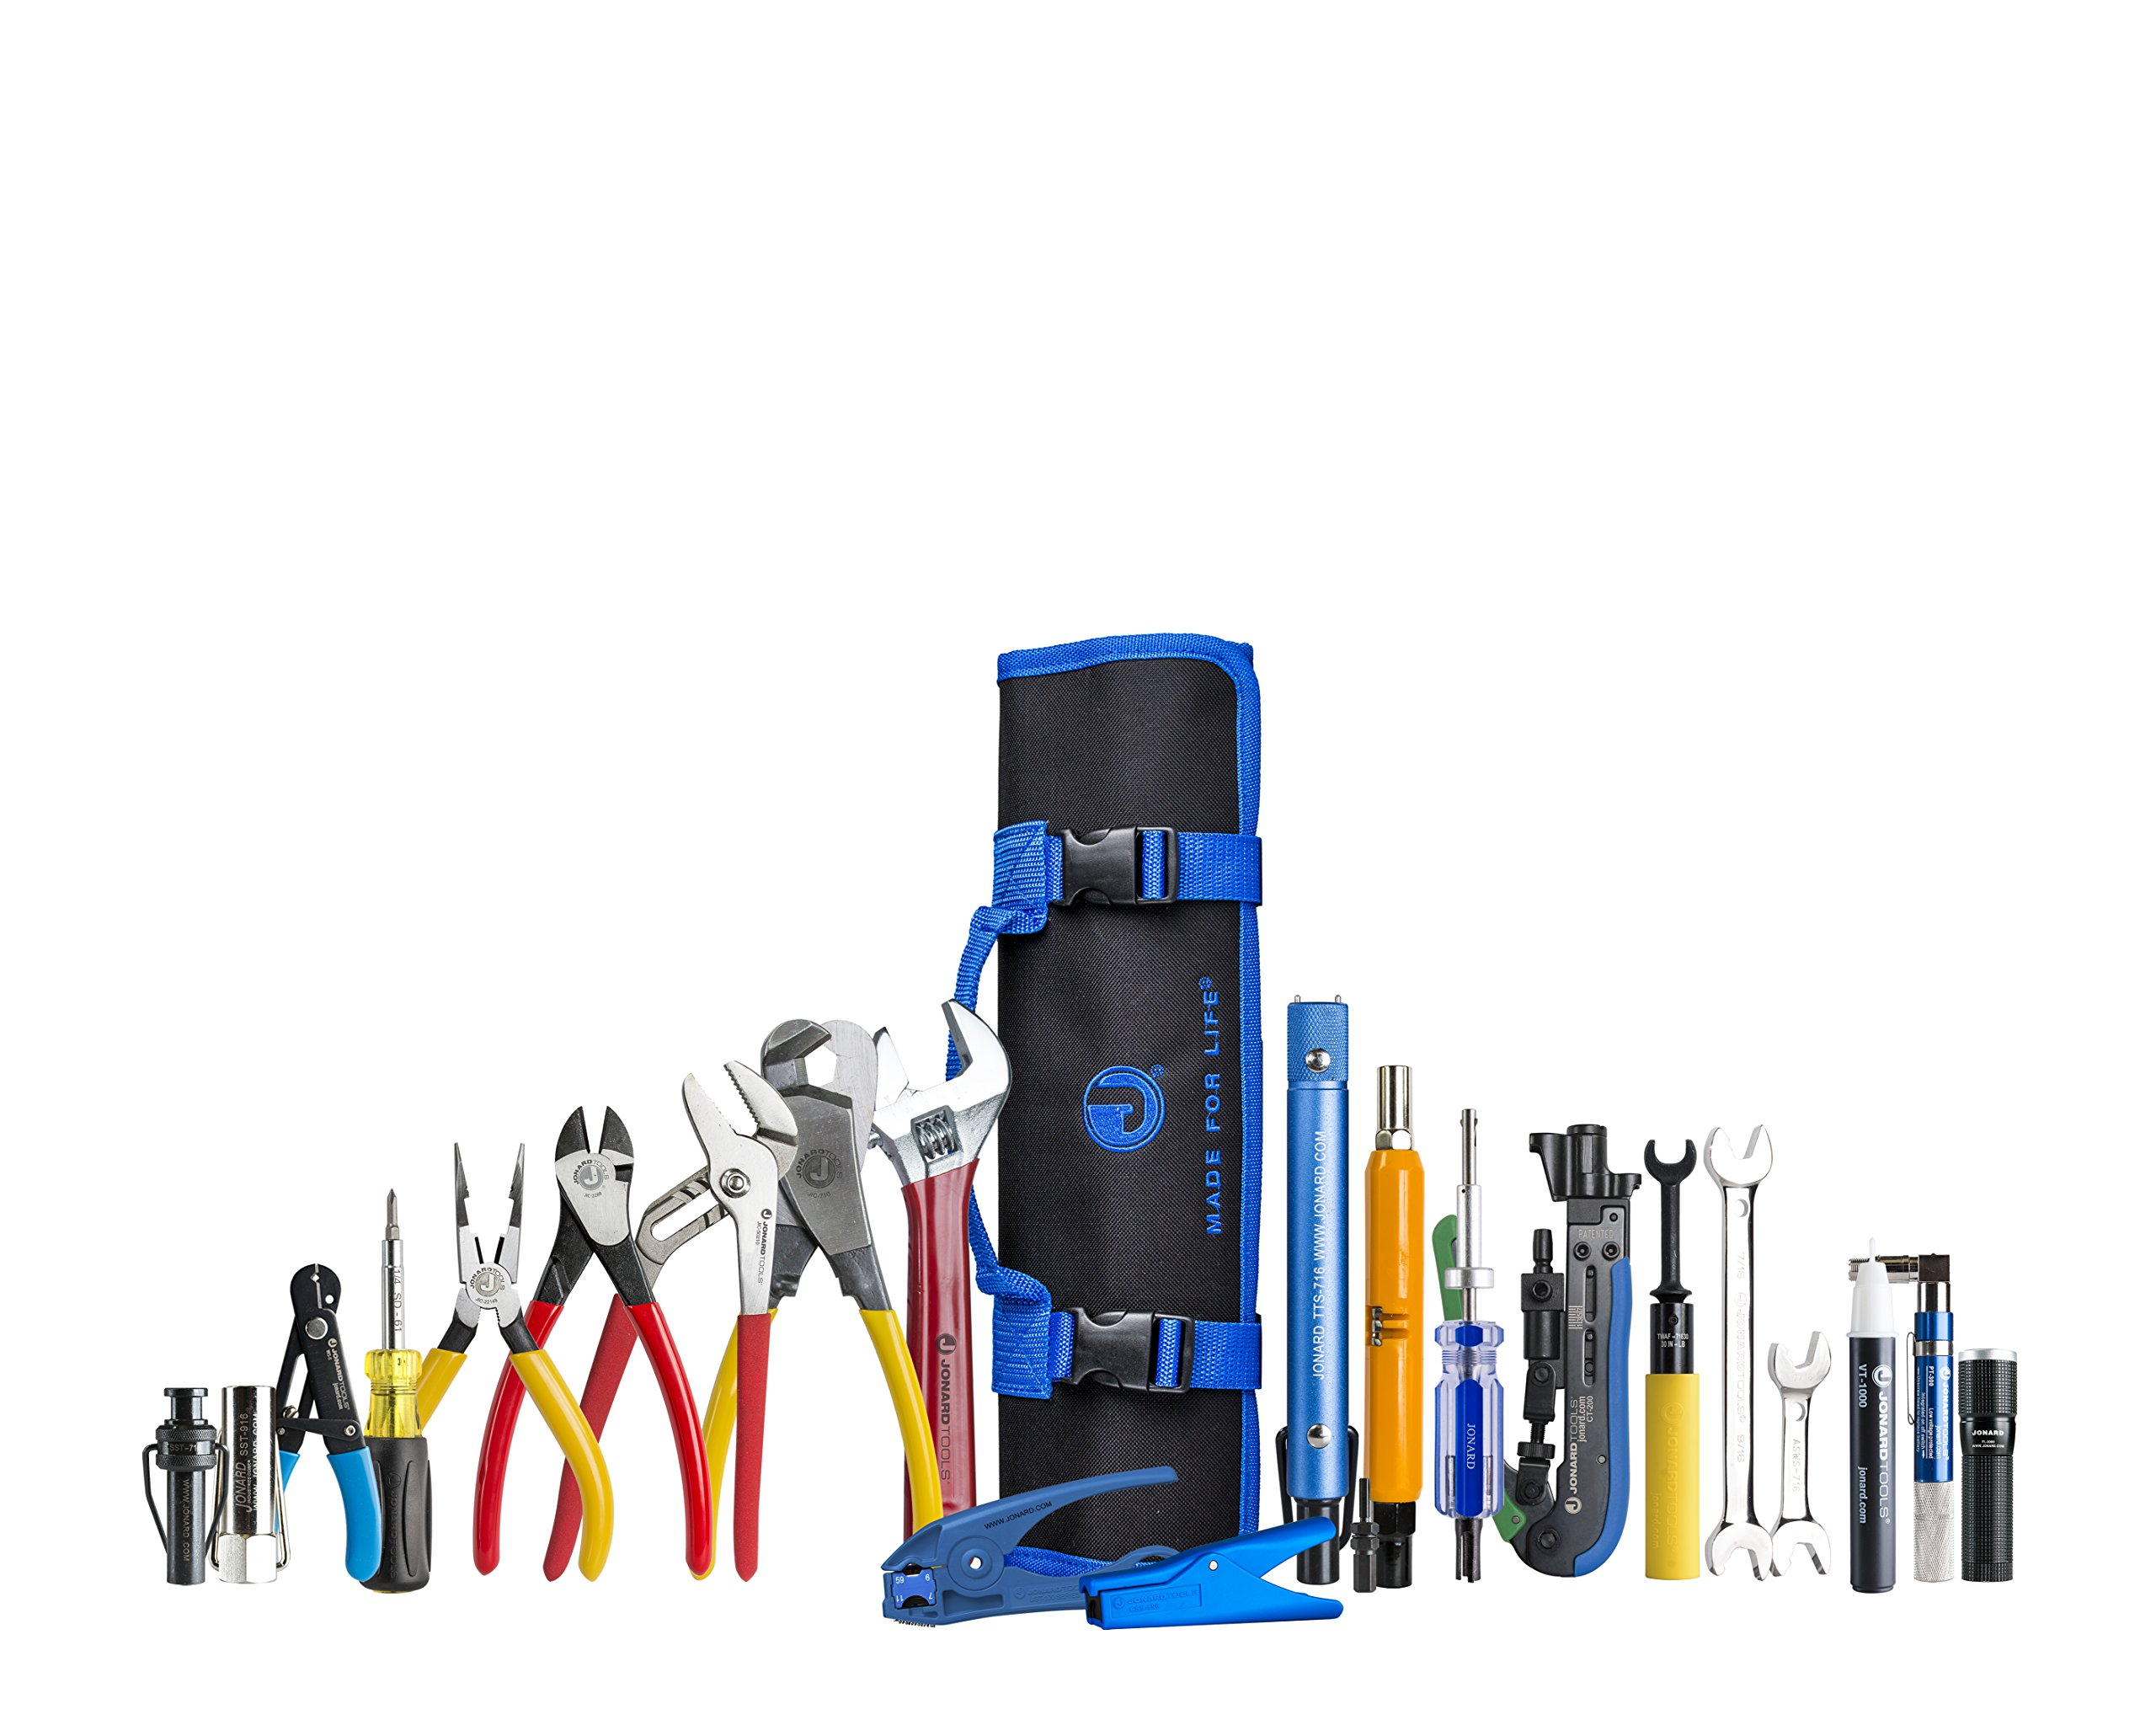 TK-822 - Professional CATV Communications Tool Kit